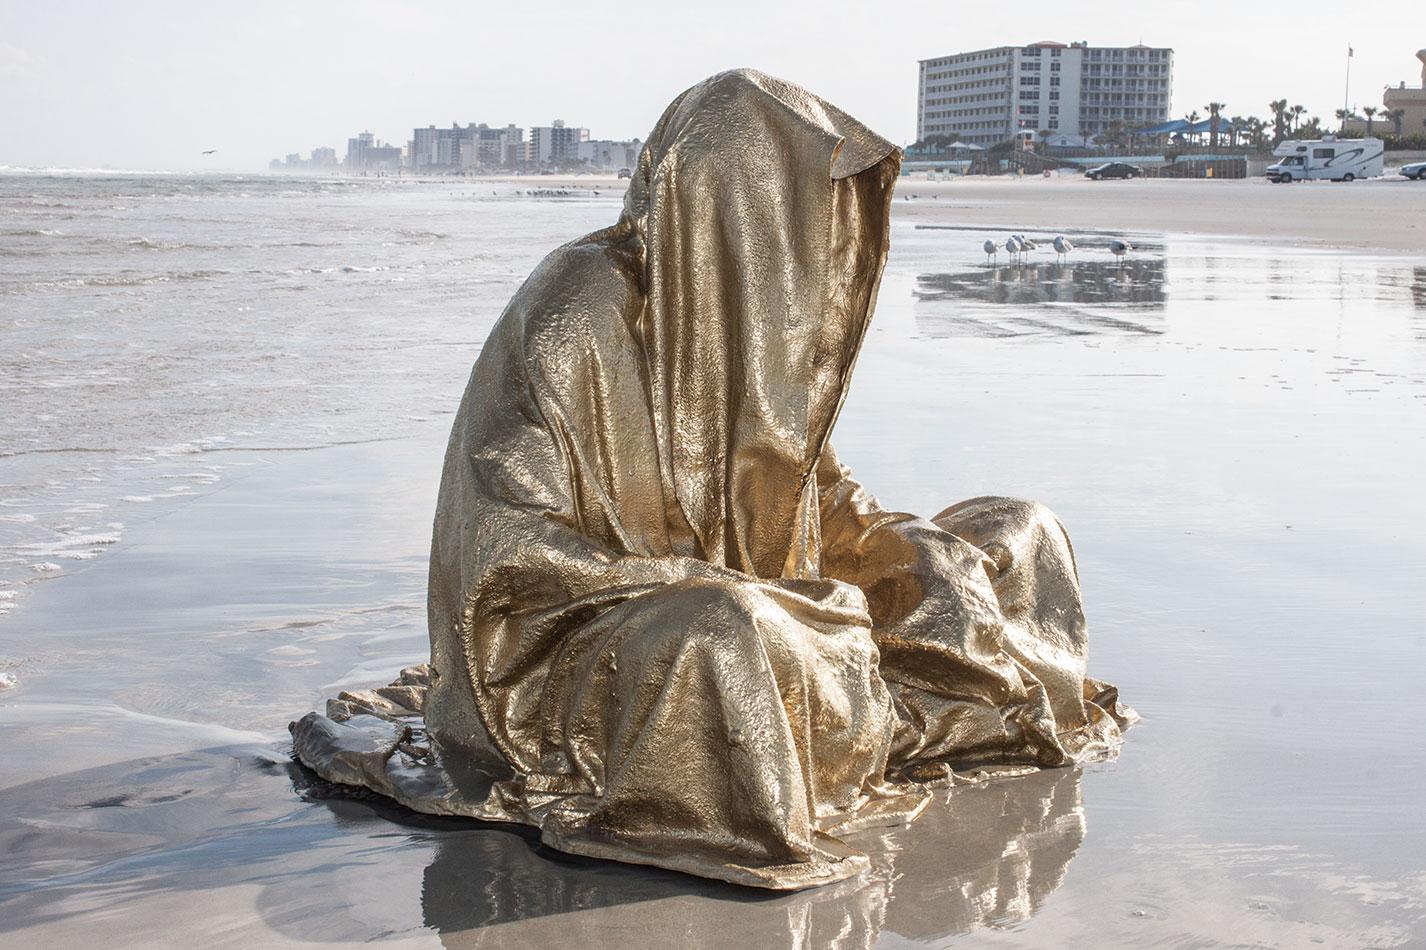 art-basel-miami-beach-fair-usa-florida-guardians-of-time-manfred-kili-kielnhofer-contemporary-fine-art-modern-arts-design-antiques-sculpture-5214